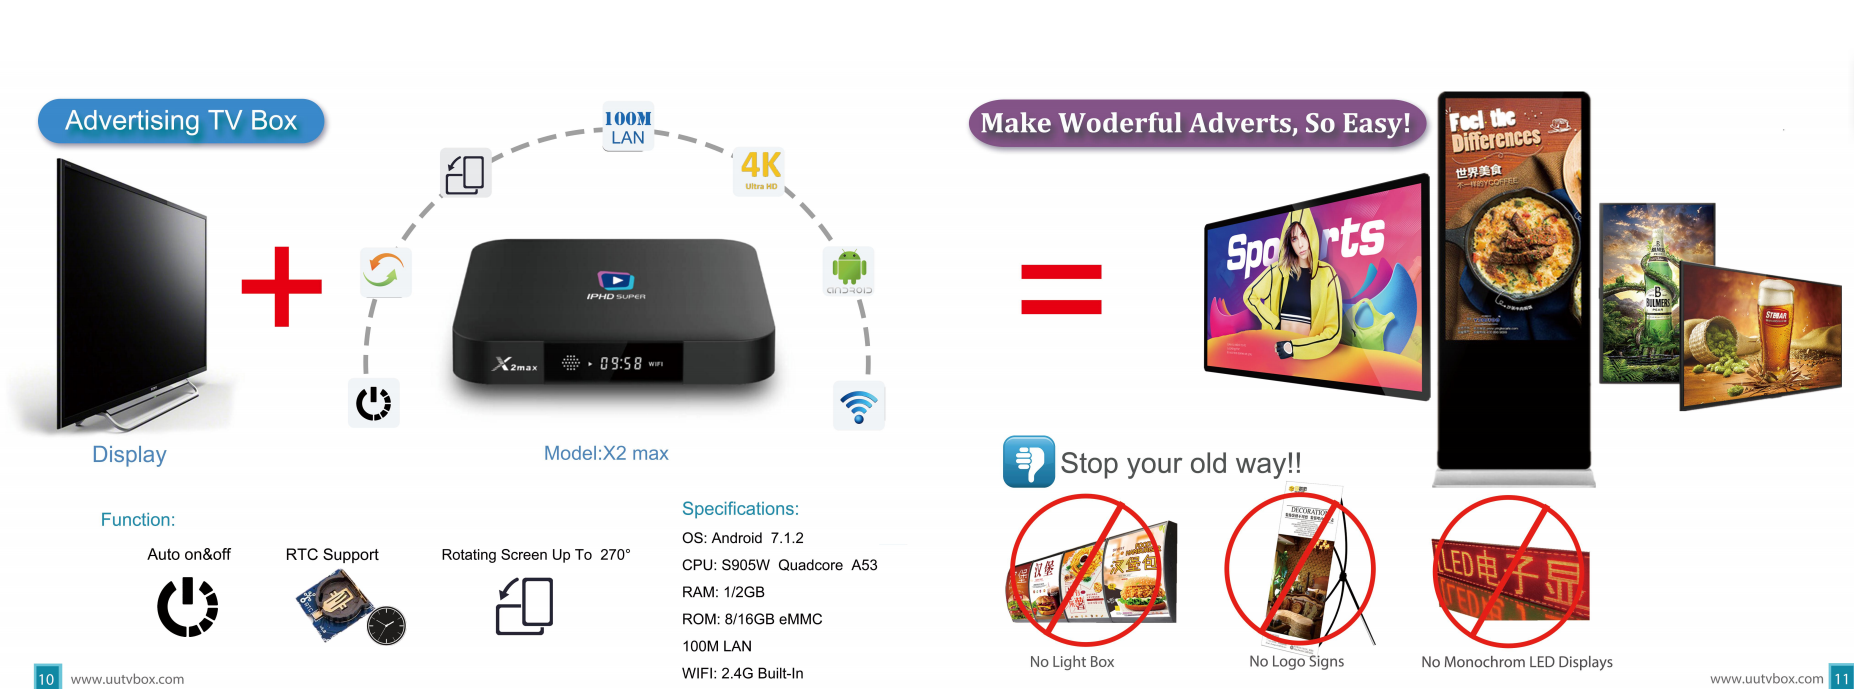 advertising Tv Box.png